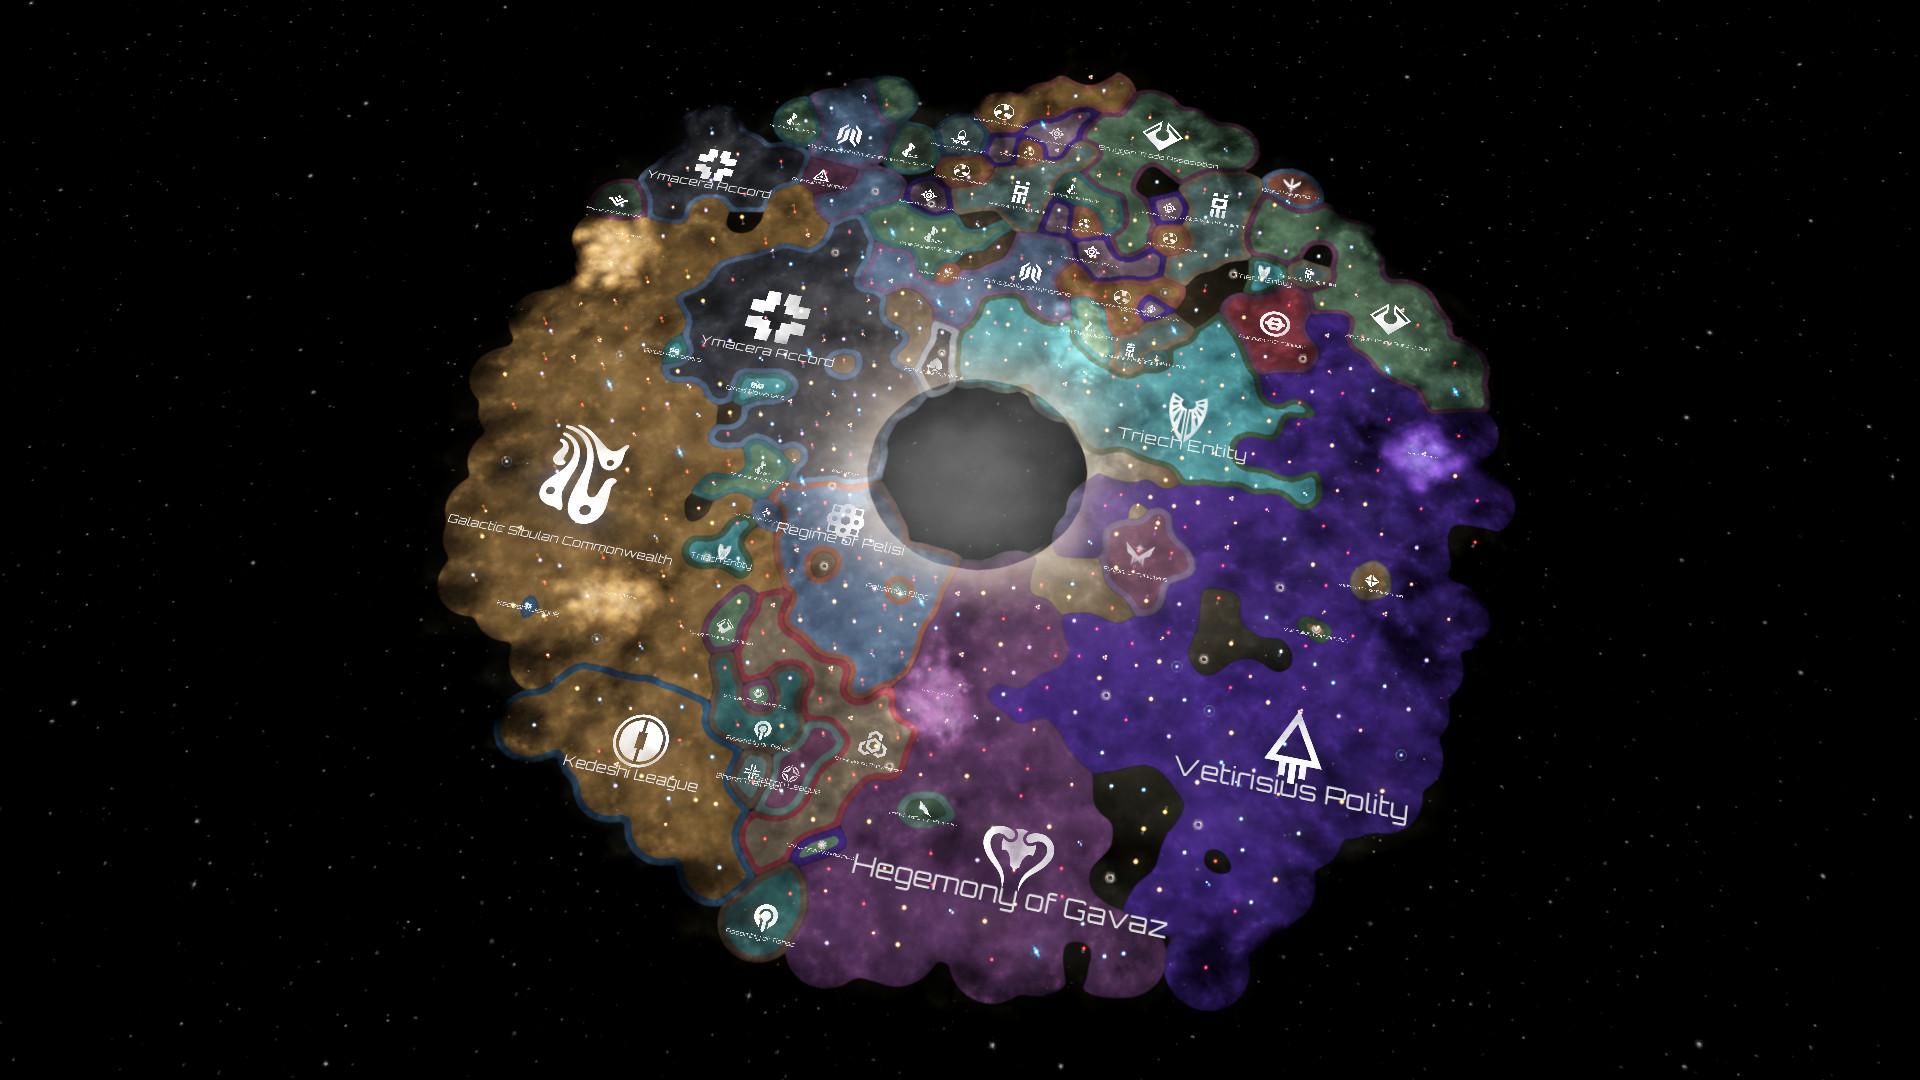 stellaris space